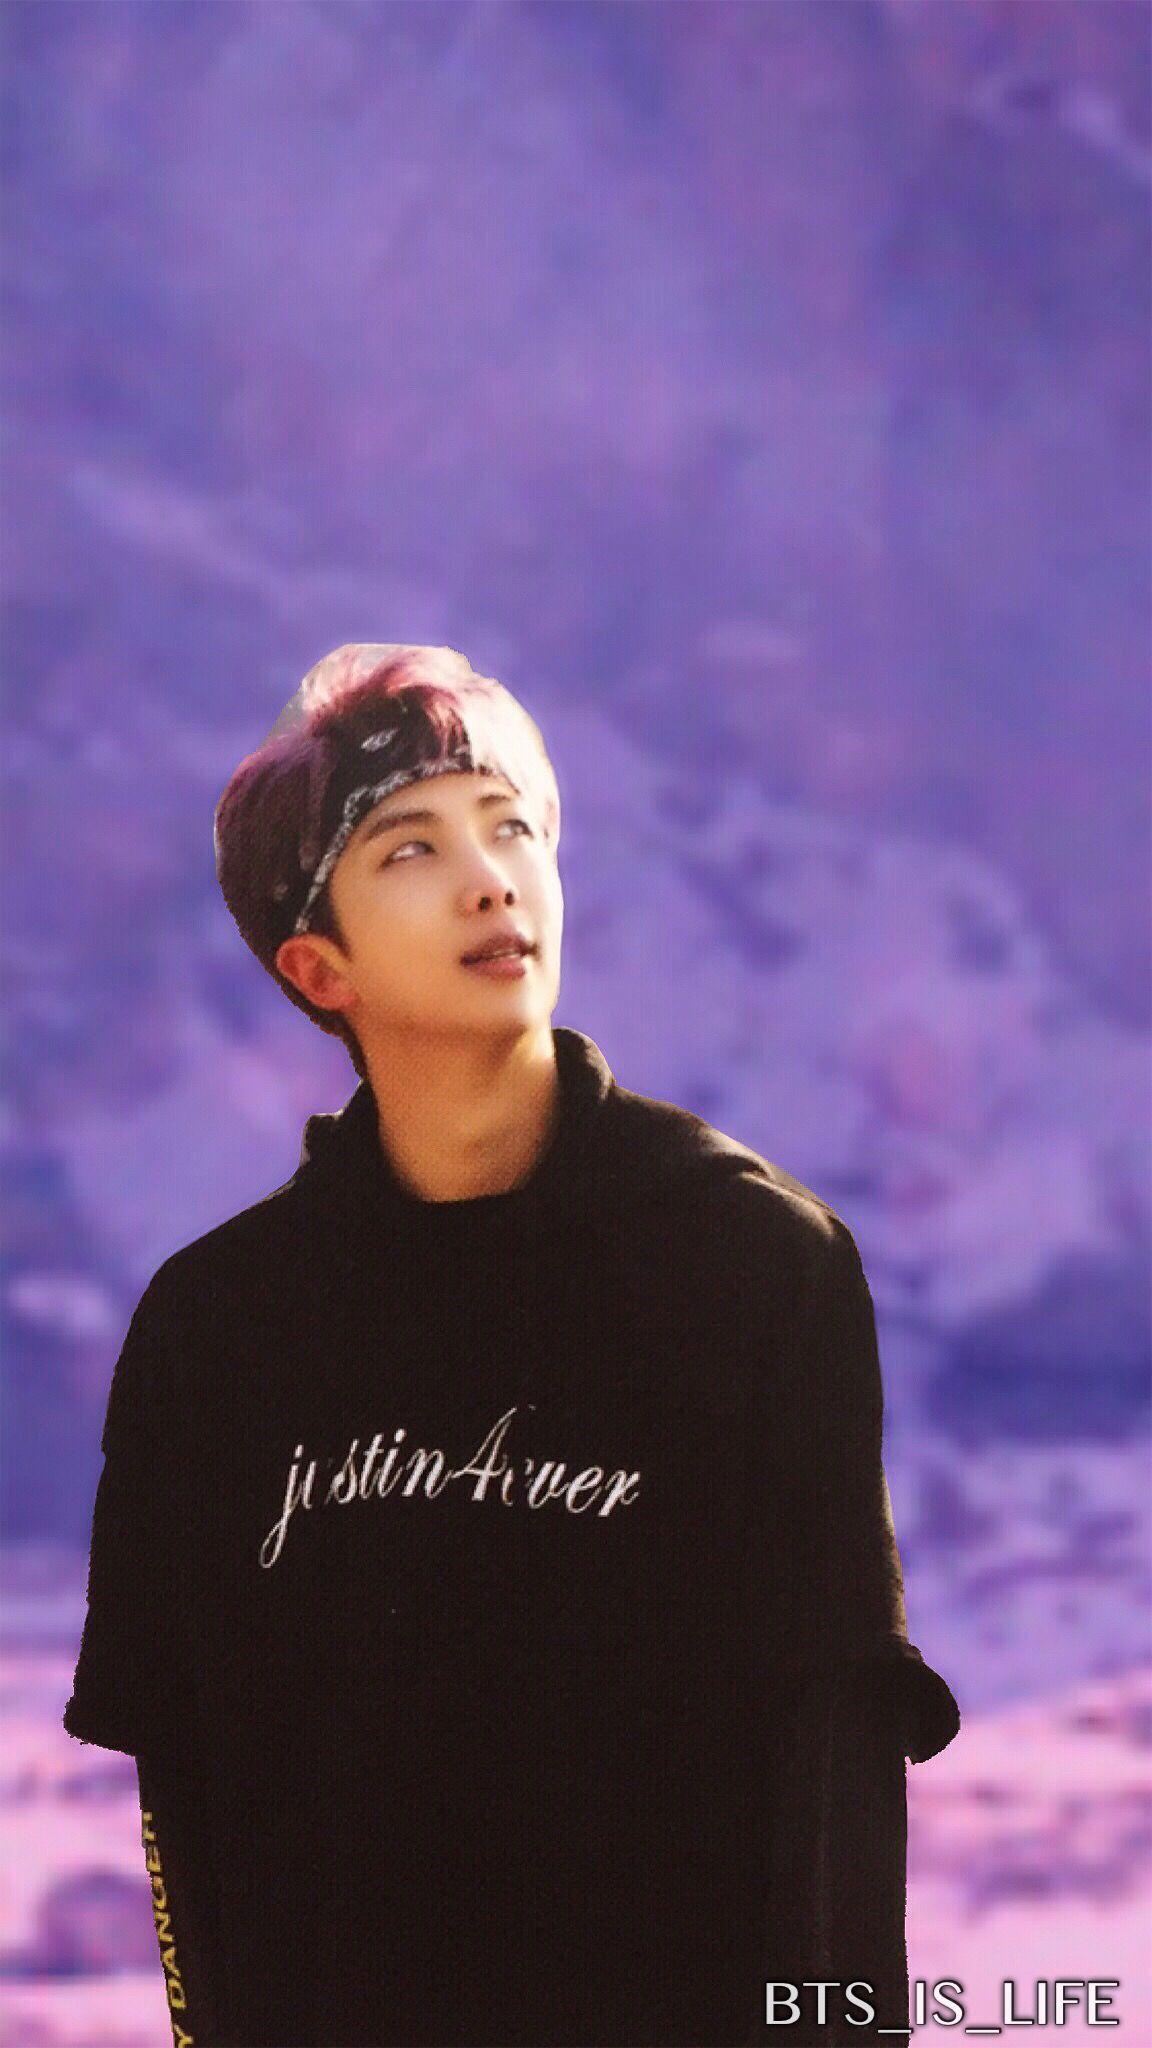 BTS RM Not Today Wallpaper in 2019 Bts not today wallpaper